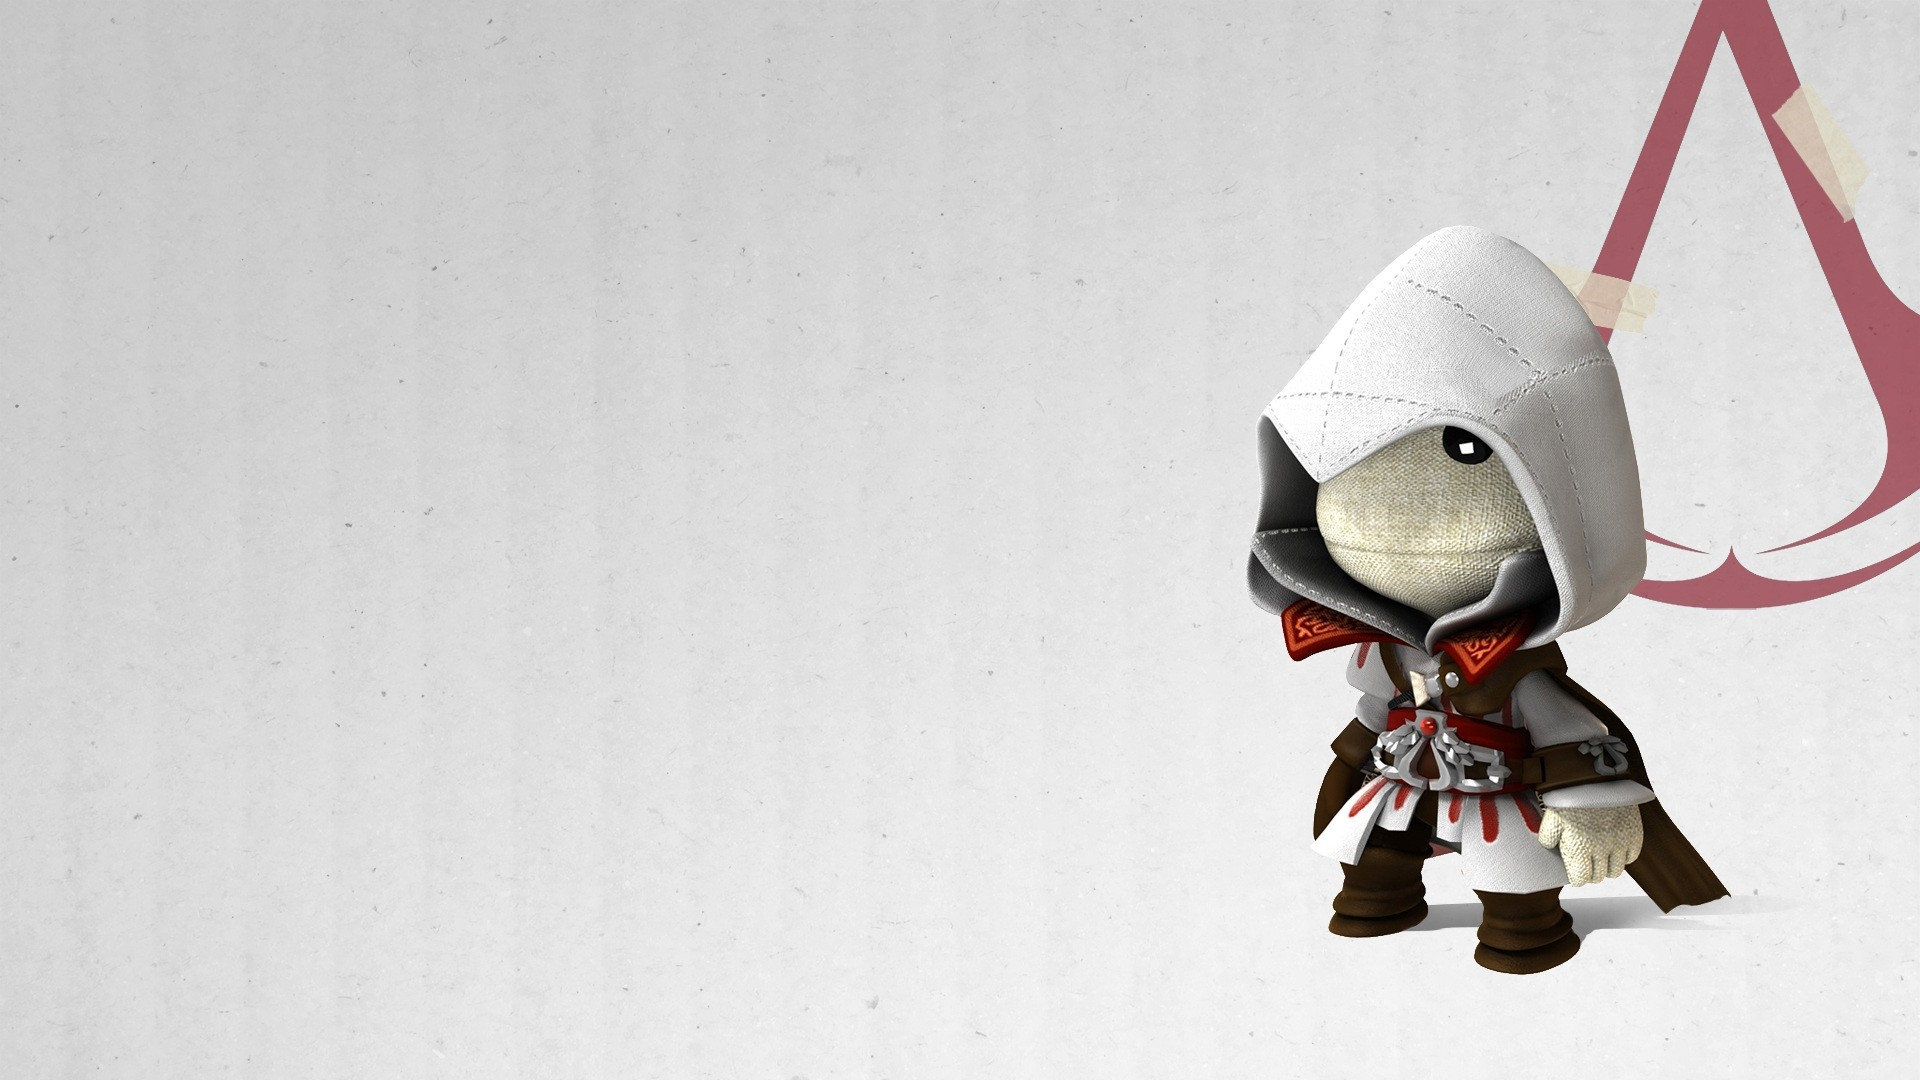 Ezio Sackboy Wallpaper 40693 1920x1080 px